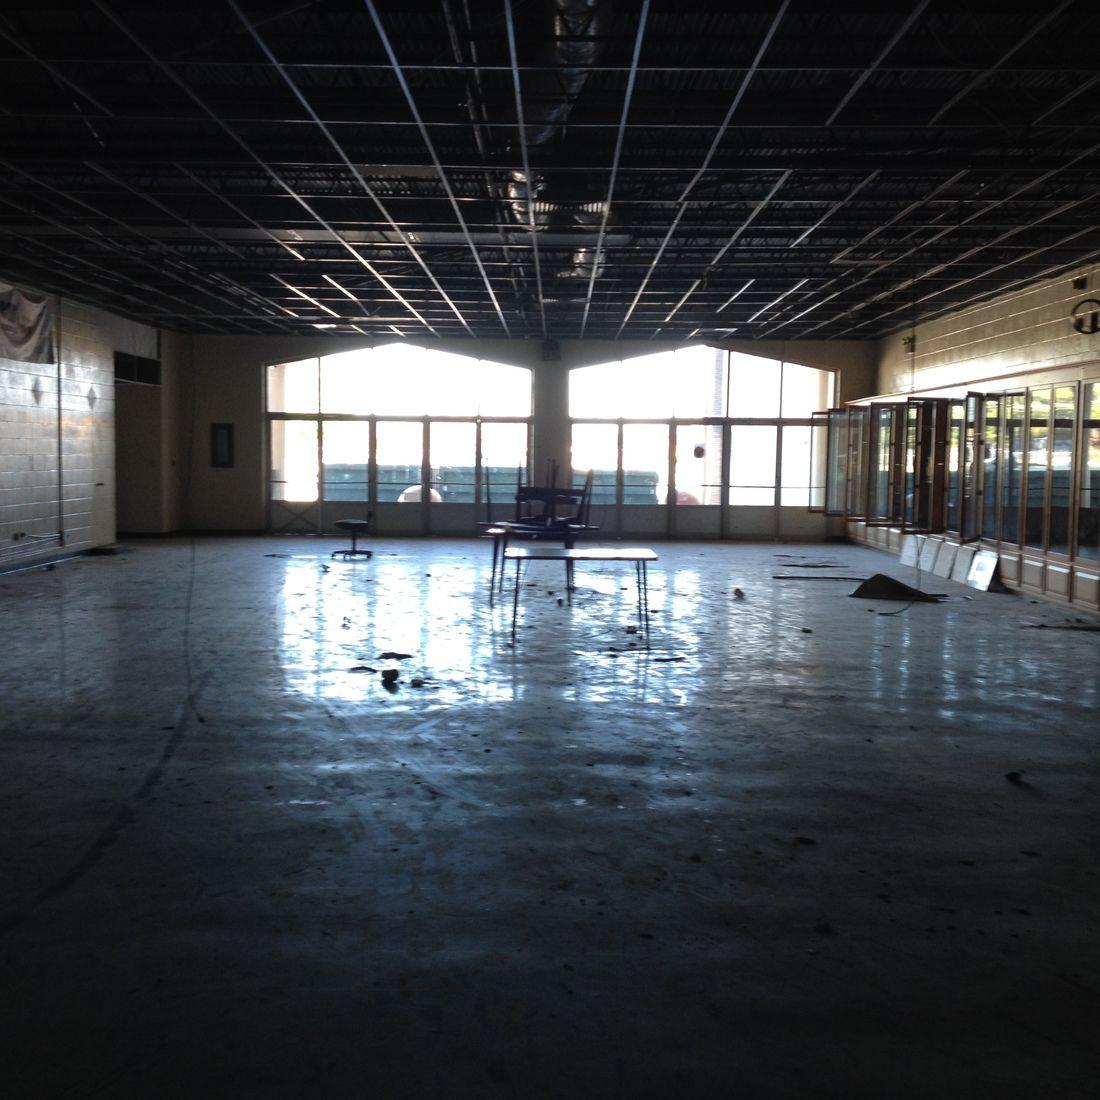 Hart County High School undergoing renovations